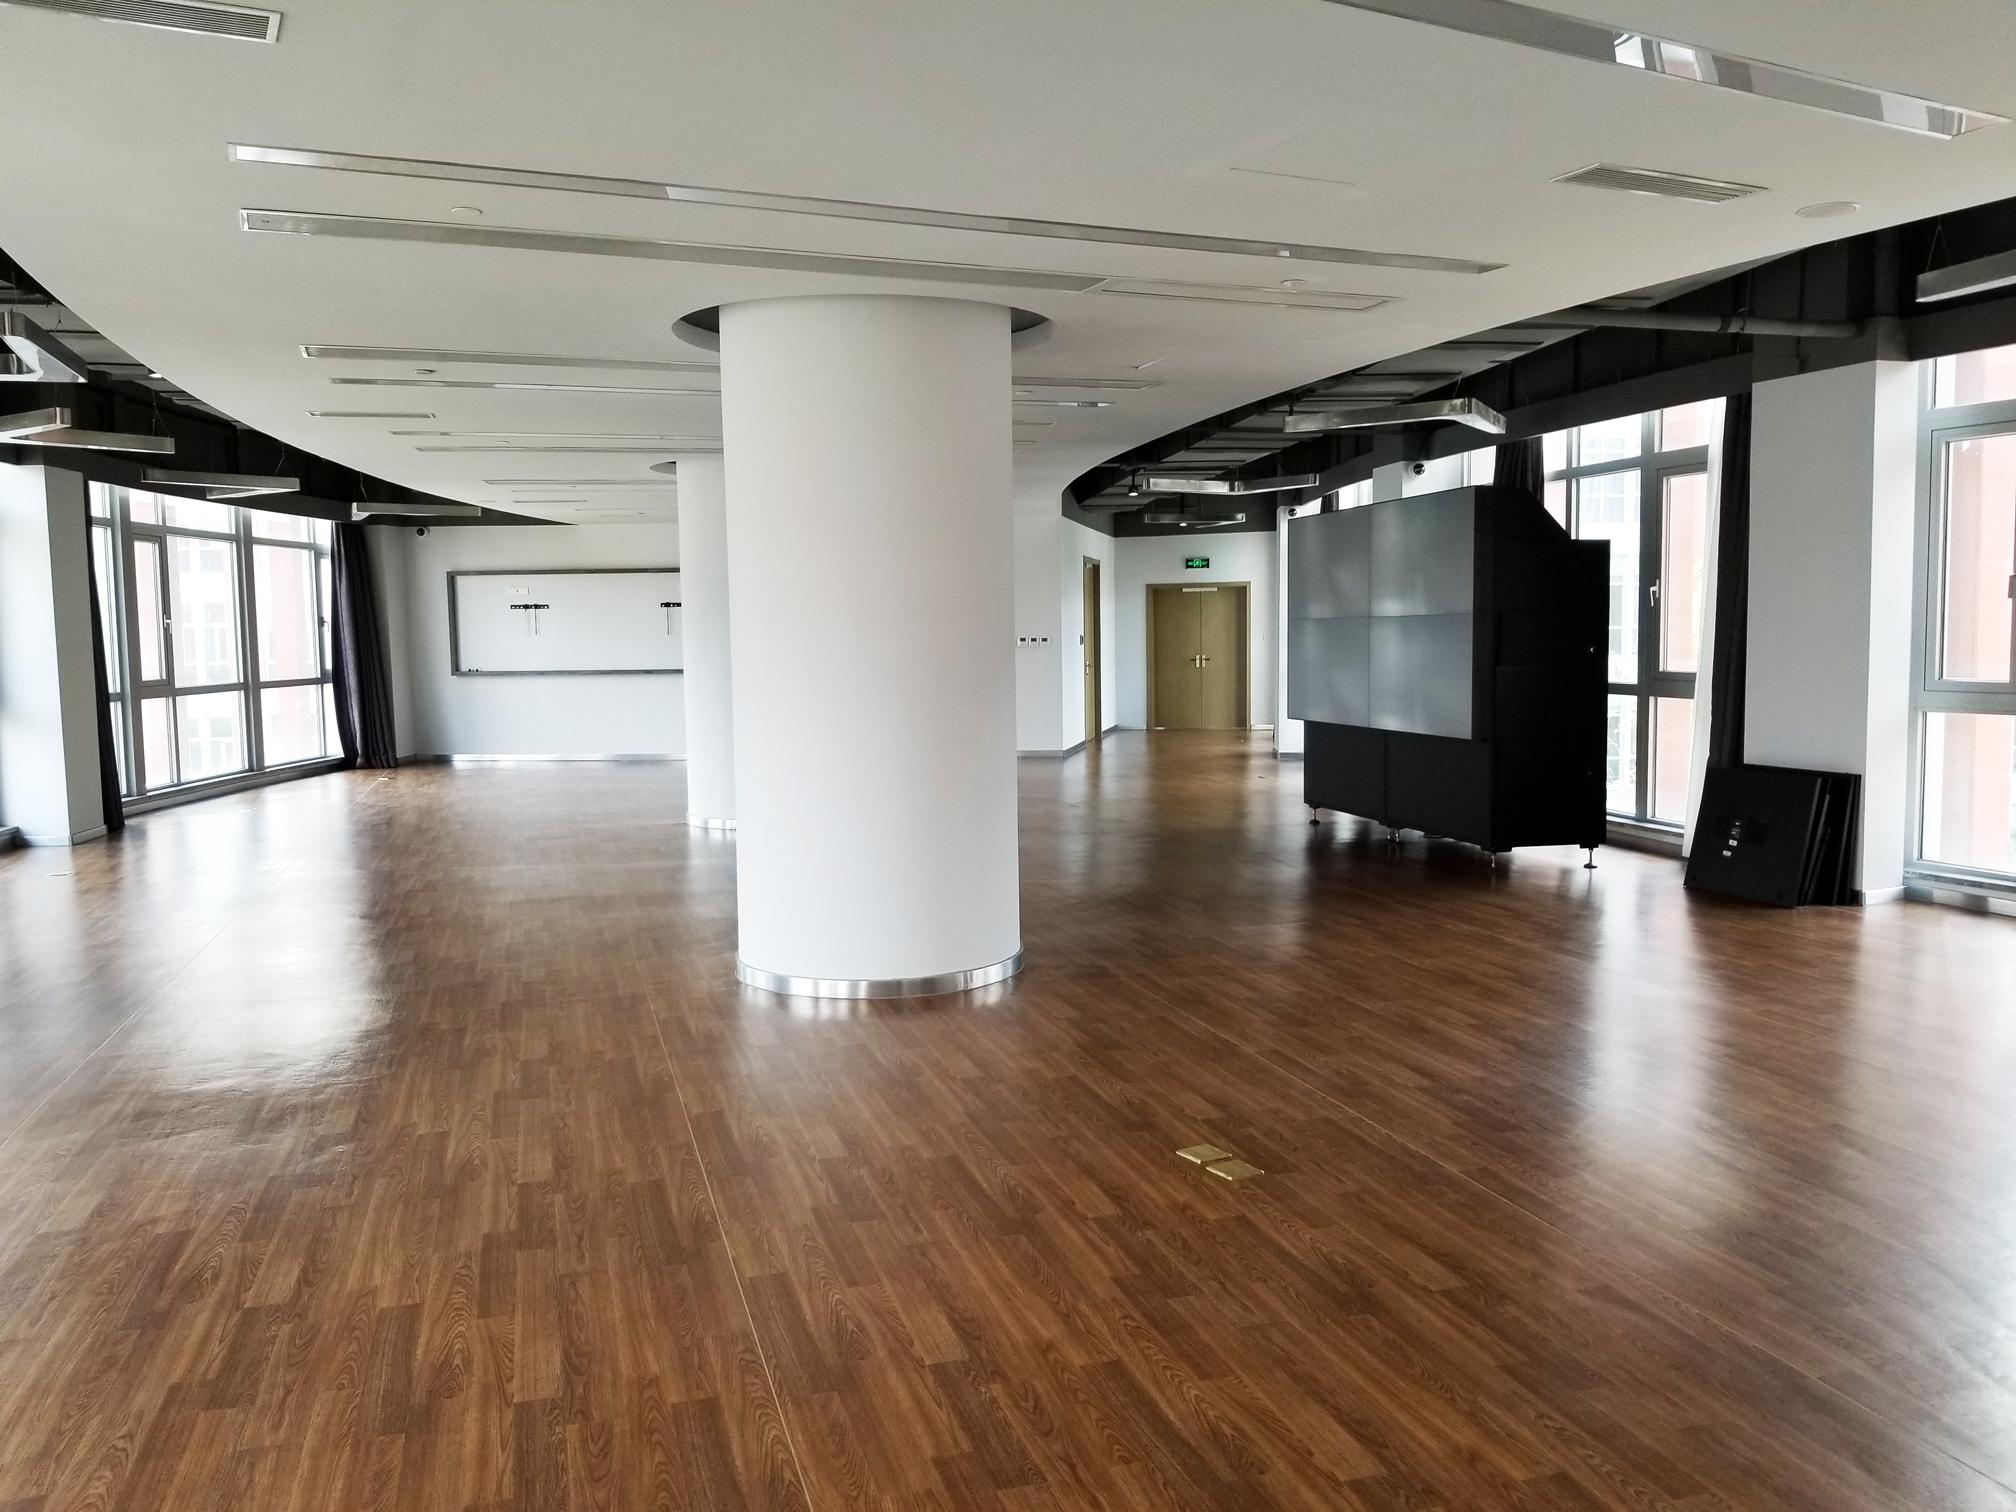 12.Exhibition-Space_classroom.jpg